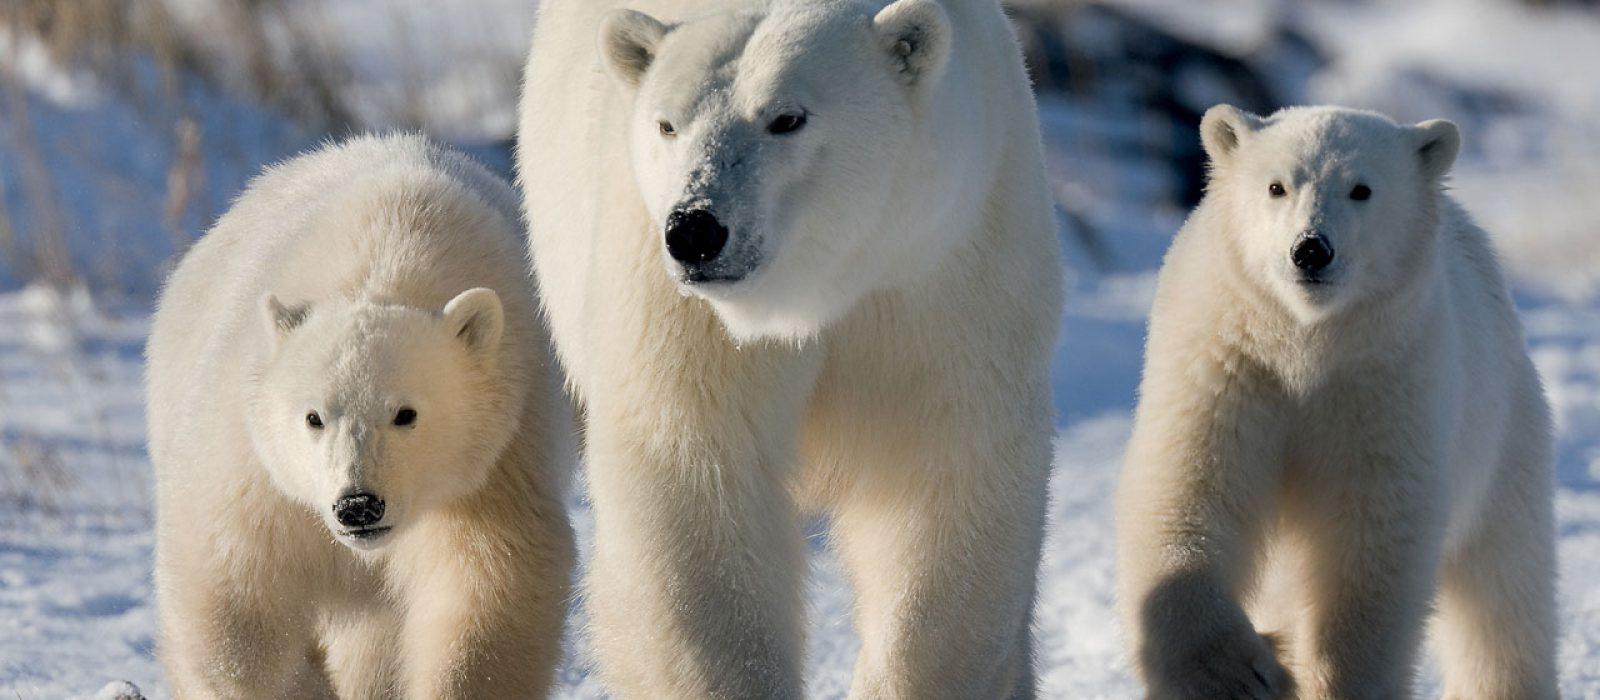 Polar bear family at Churchill Wild, Manitoba